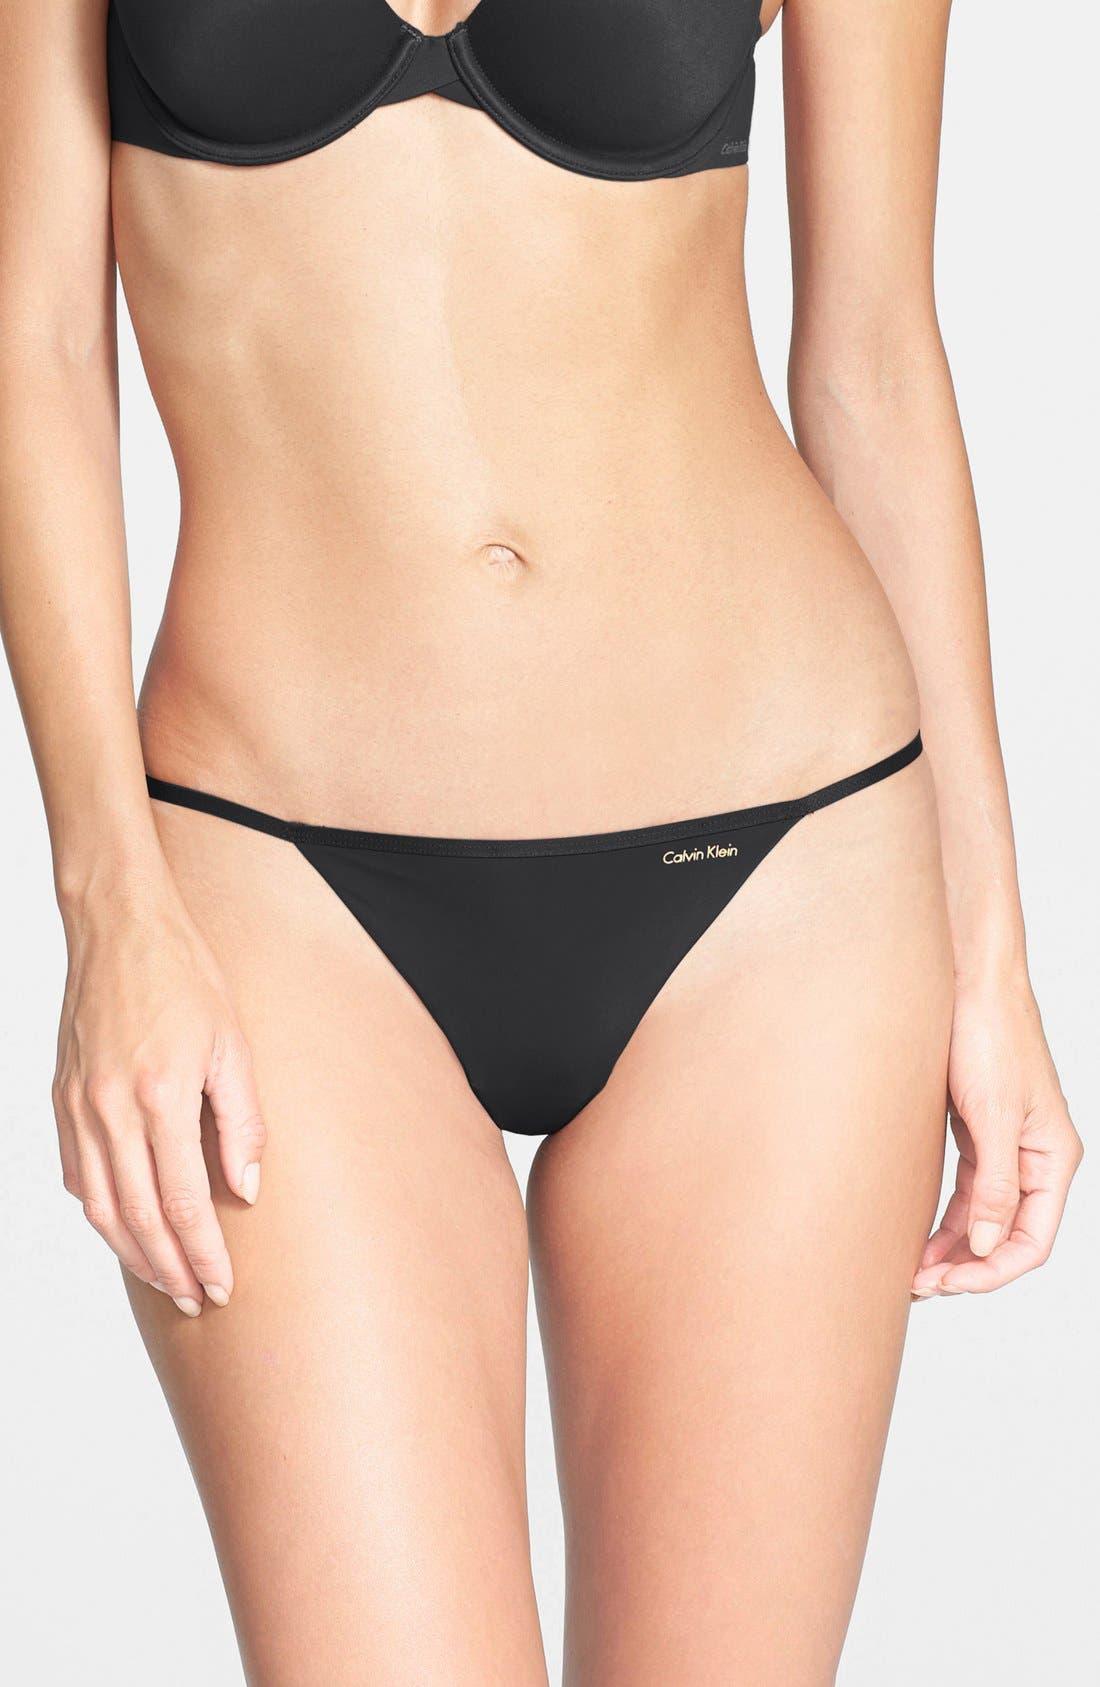 Calvin Klein Sleek G-String Thong (3 for $33)